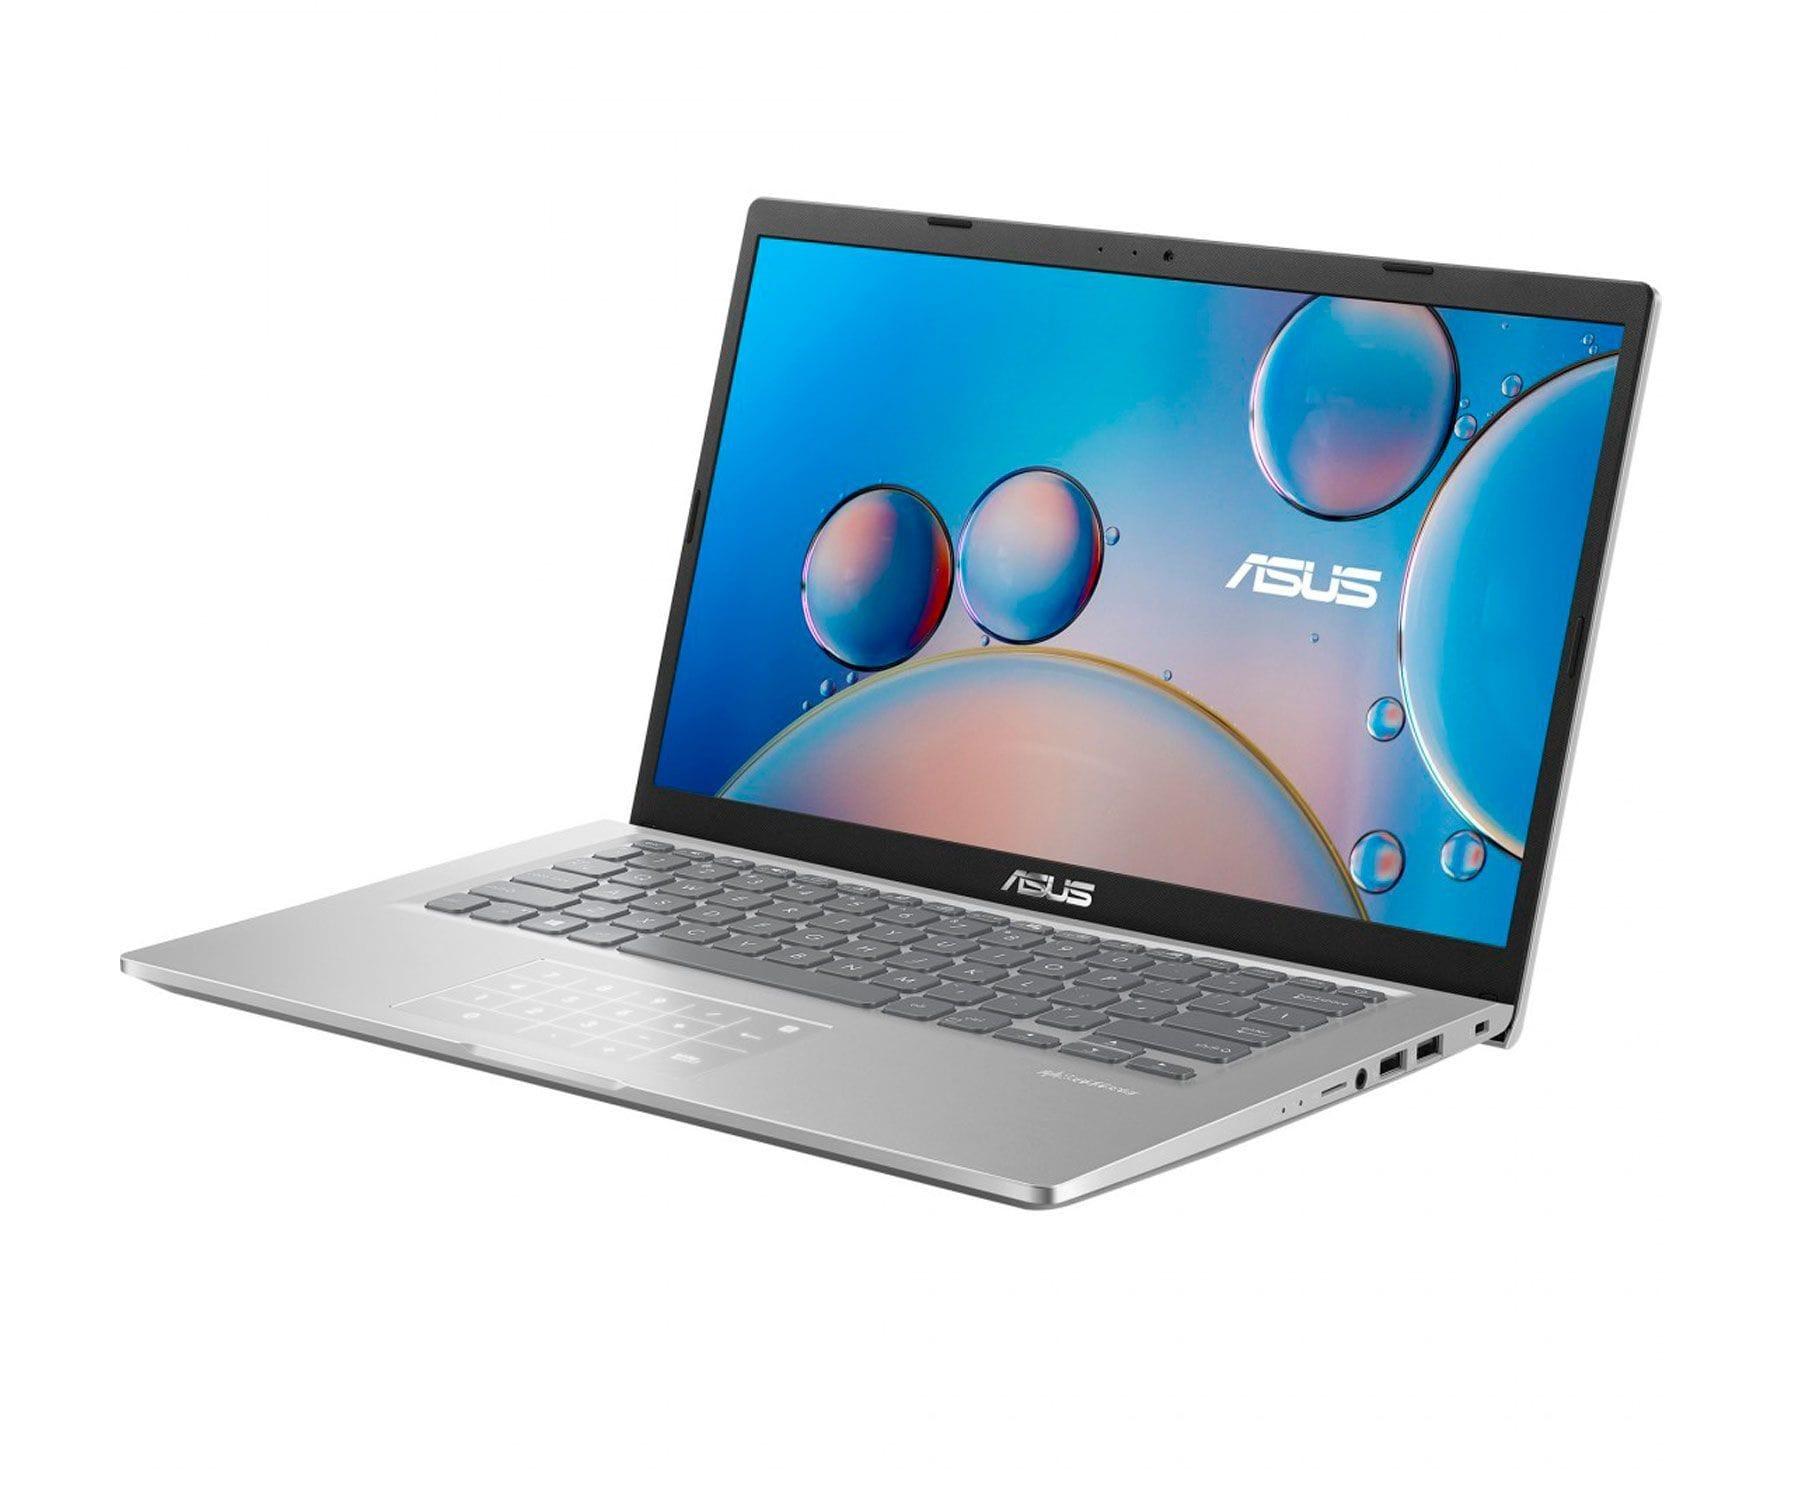 Asus F415EA-EK115T Intel Core i5-1135G7/8GB/512 GB/14'' FHD/Plata/Windows 10 Home